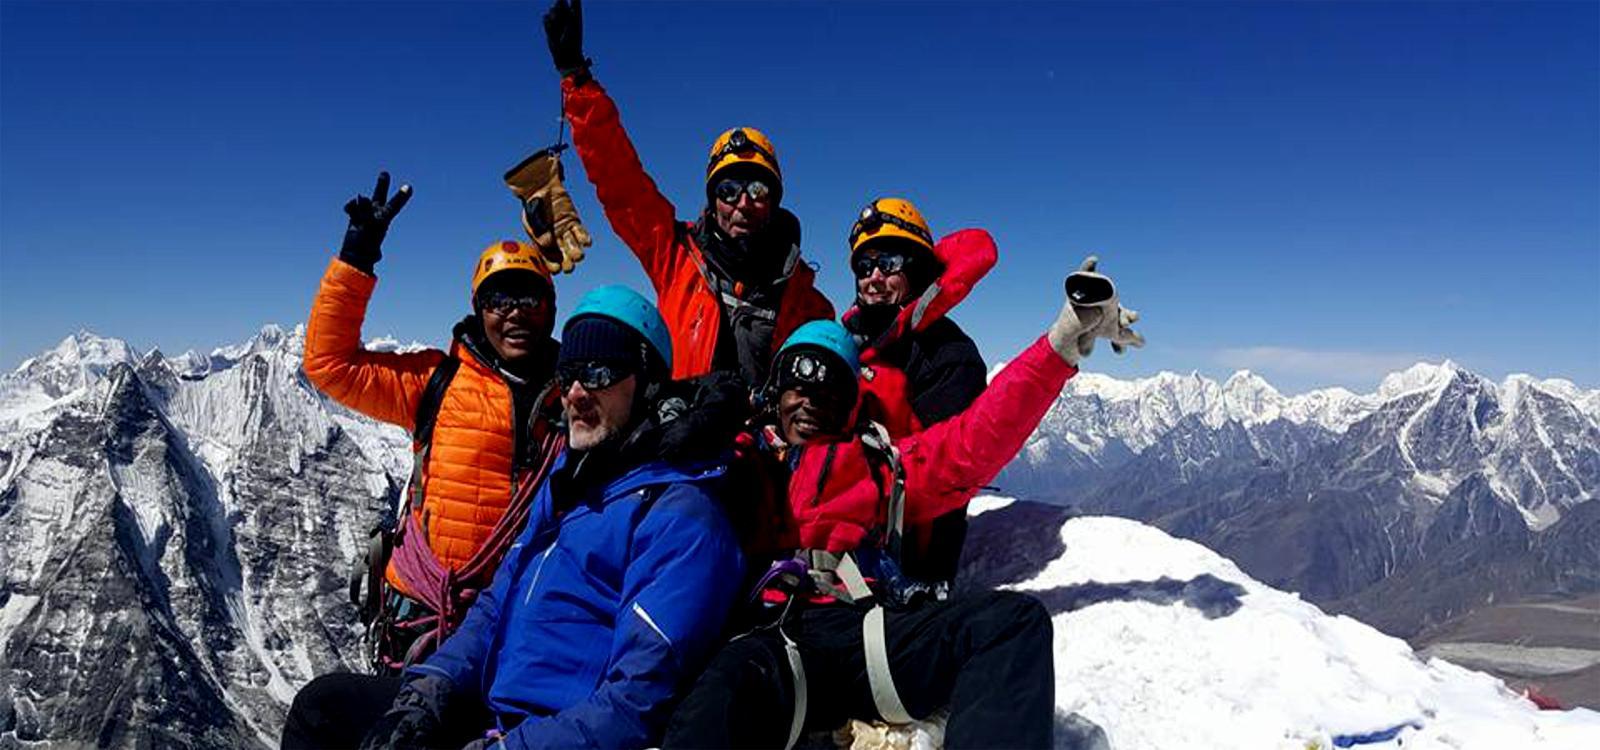 Lobuche East & Island Peak climbing